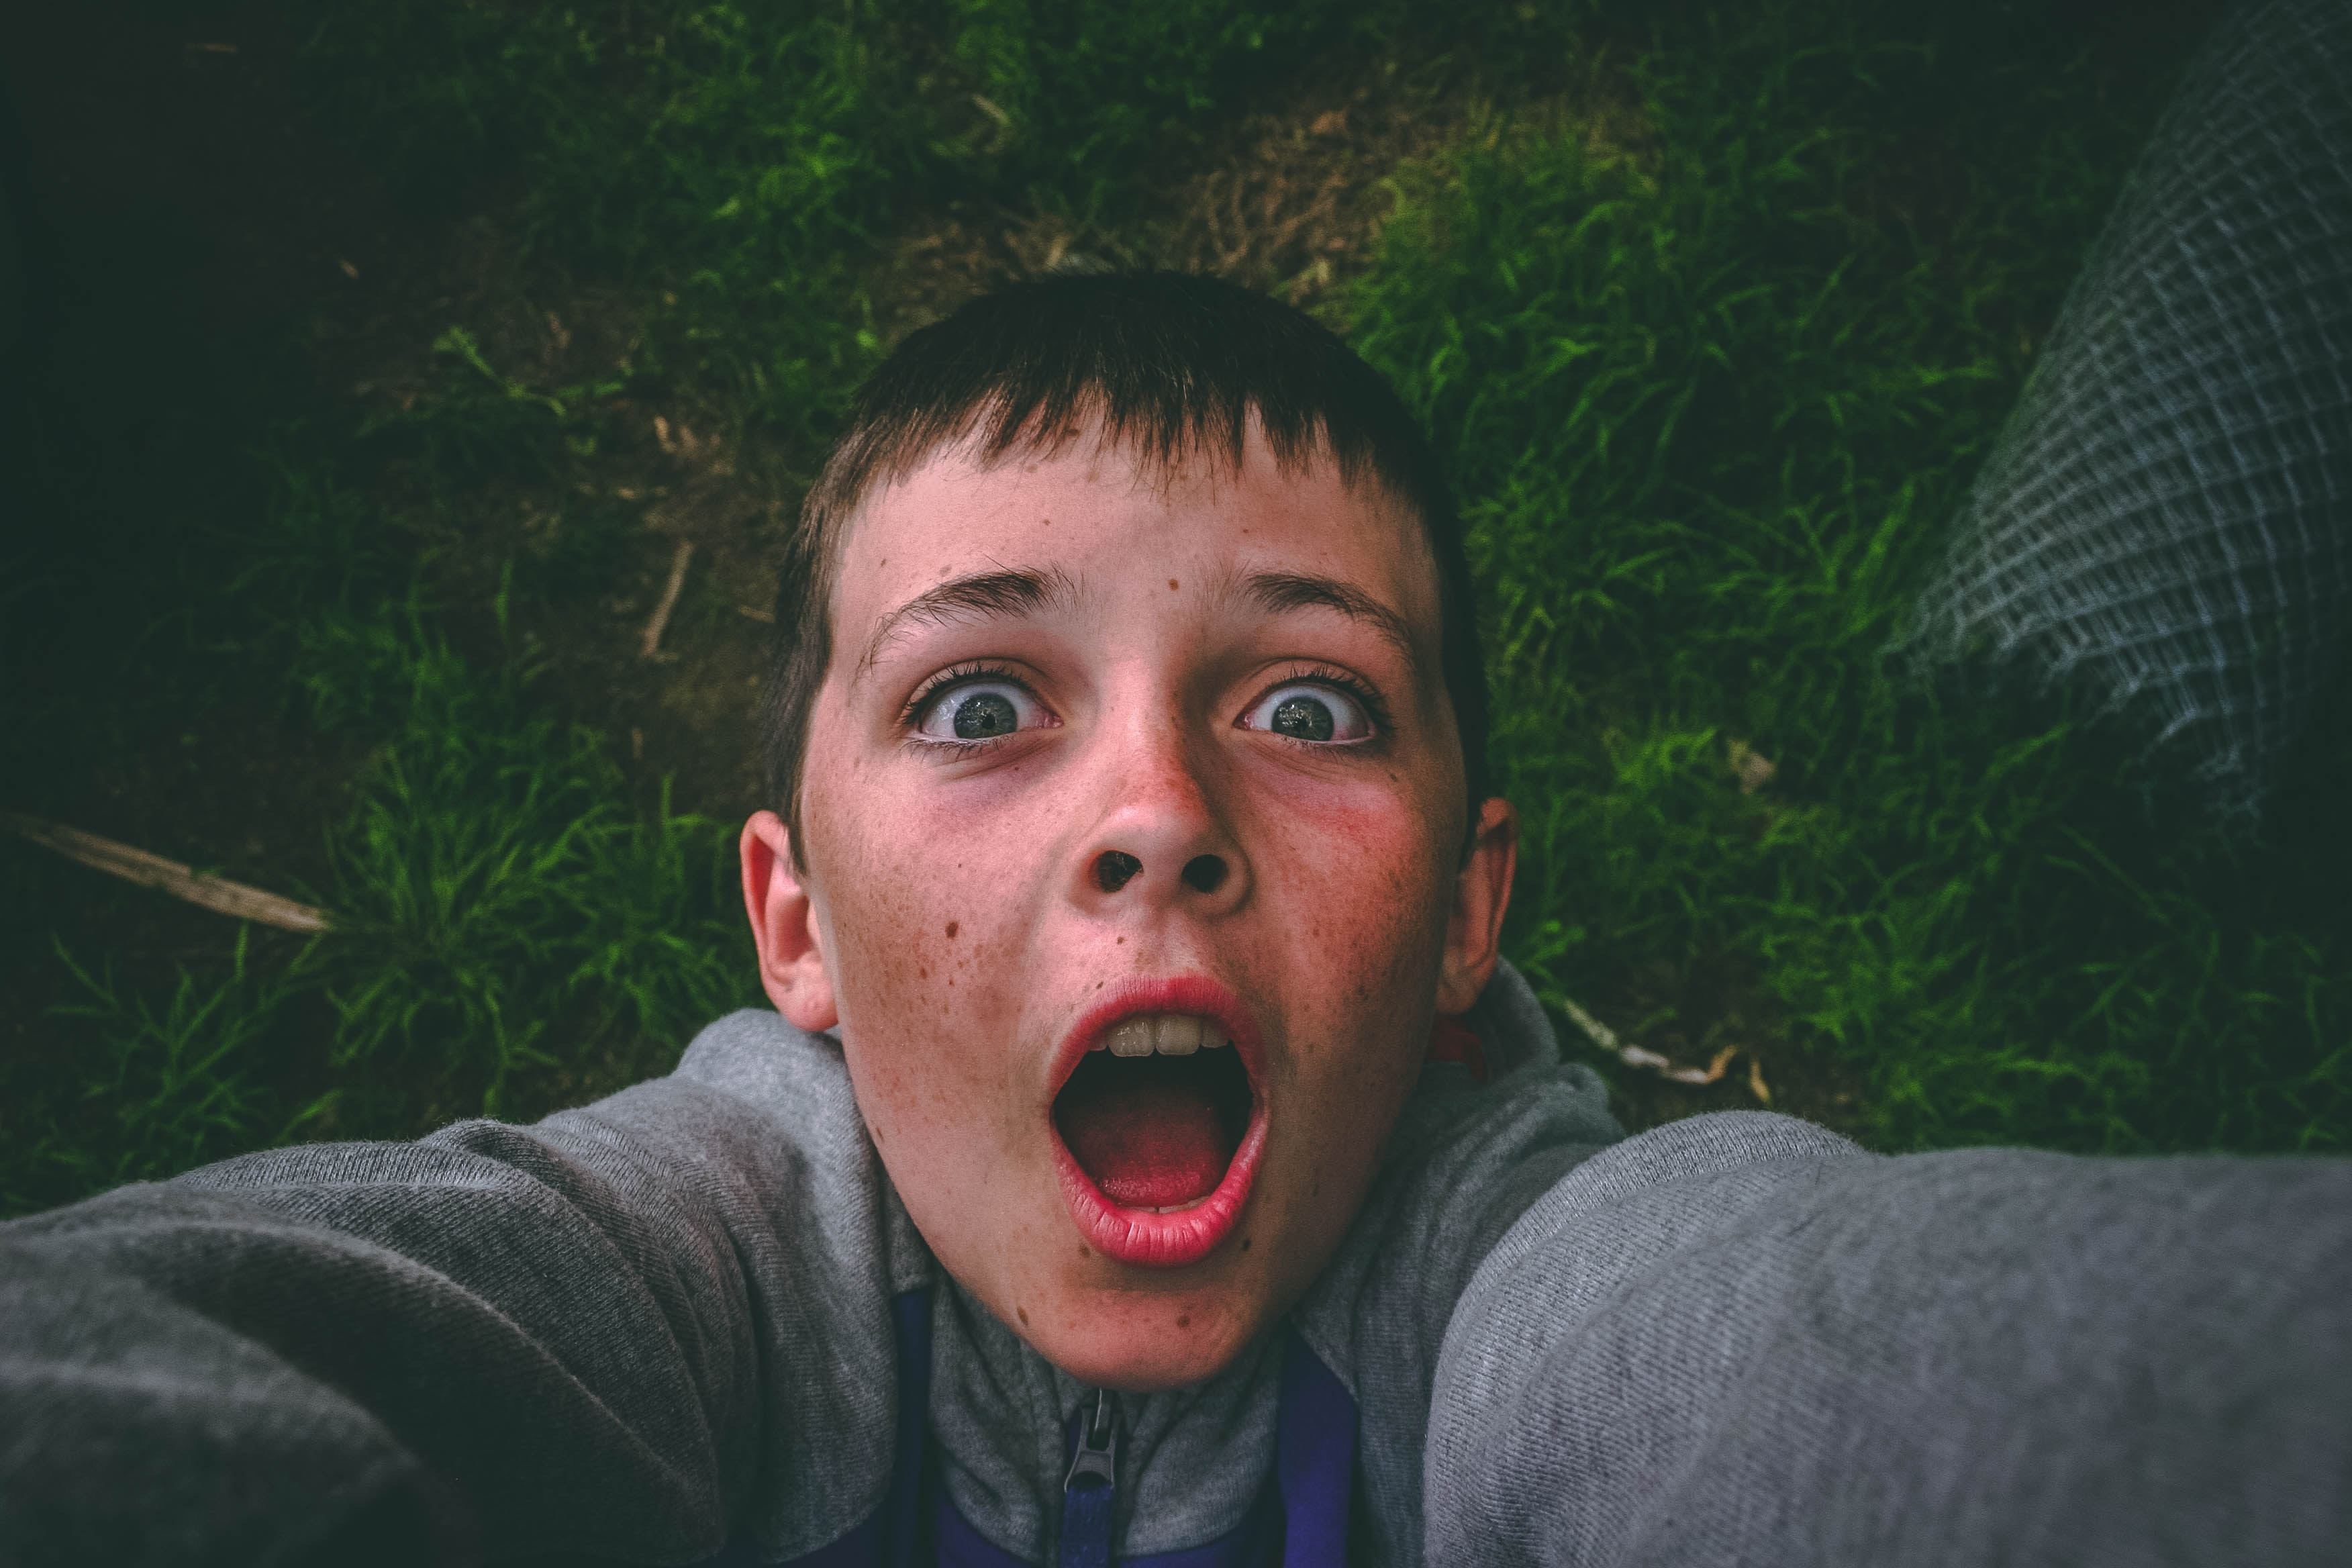 Opened Mouth Black Haired Boy in Gray Full-zip Jacket Standing on Grass Field Taking Selfie, Boy, Portrait, Wear, Surprise, HQ Photo